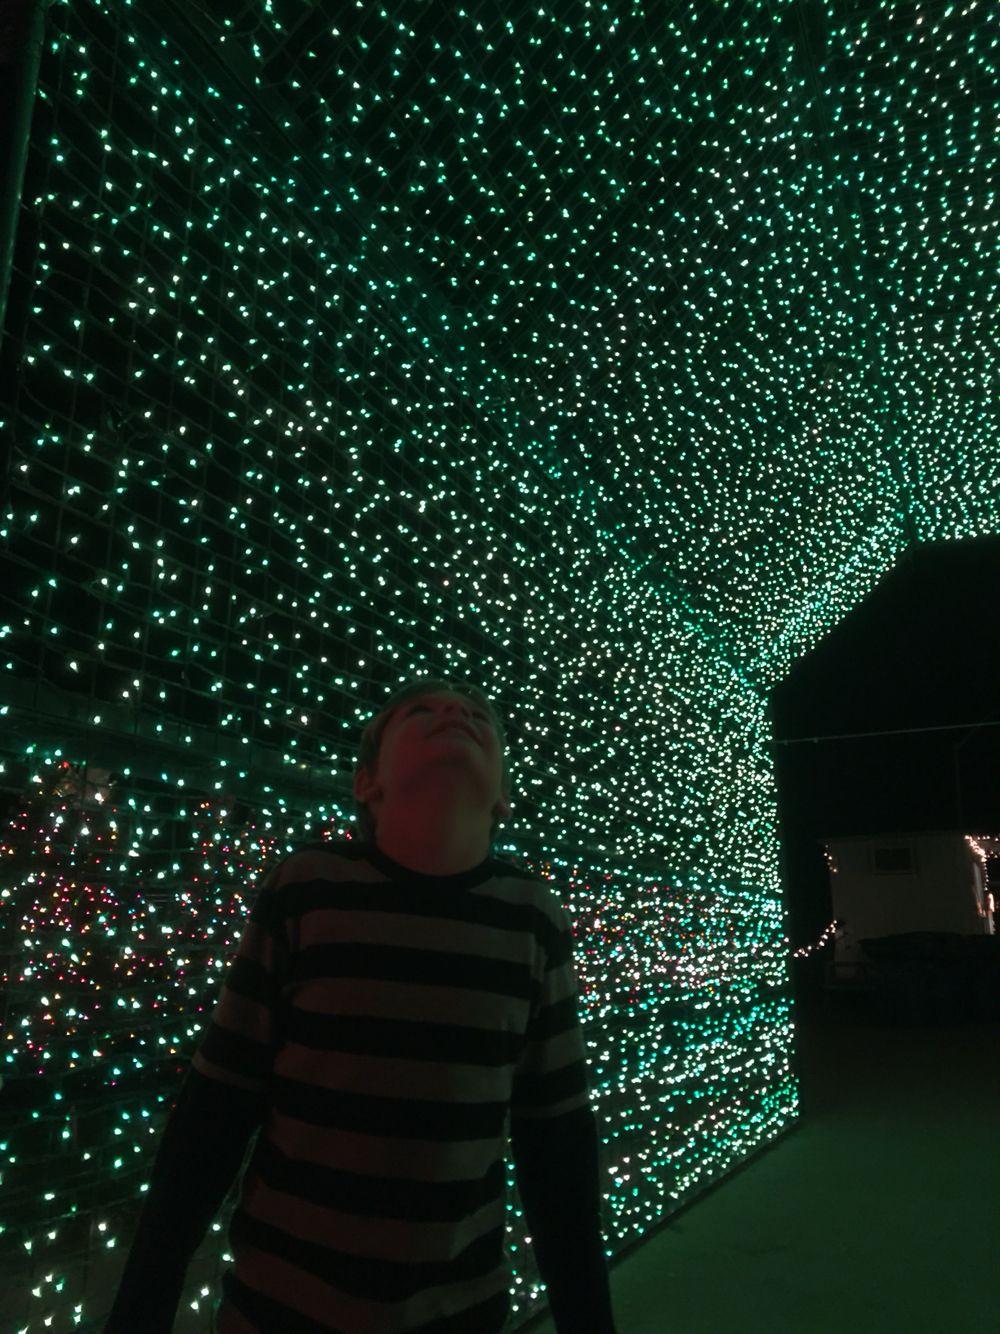 Marble Falls Christmas Lights.Walkway Of Lights Marble Falls Tx Christmas 2015